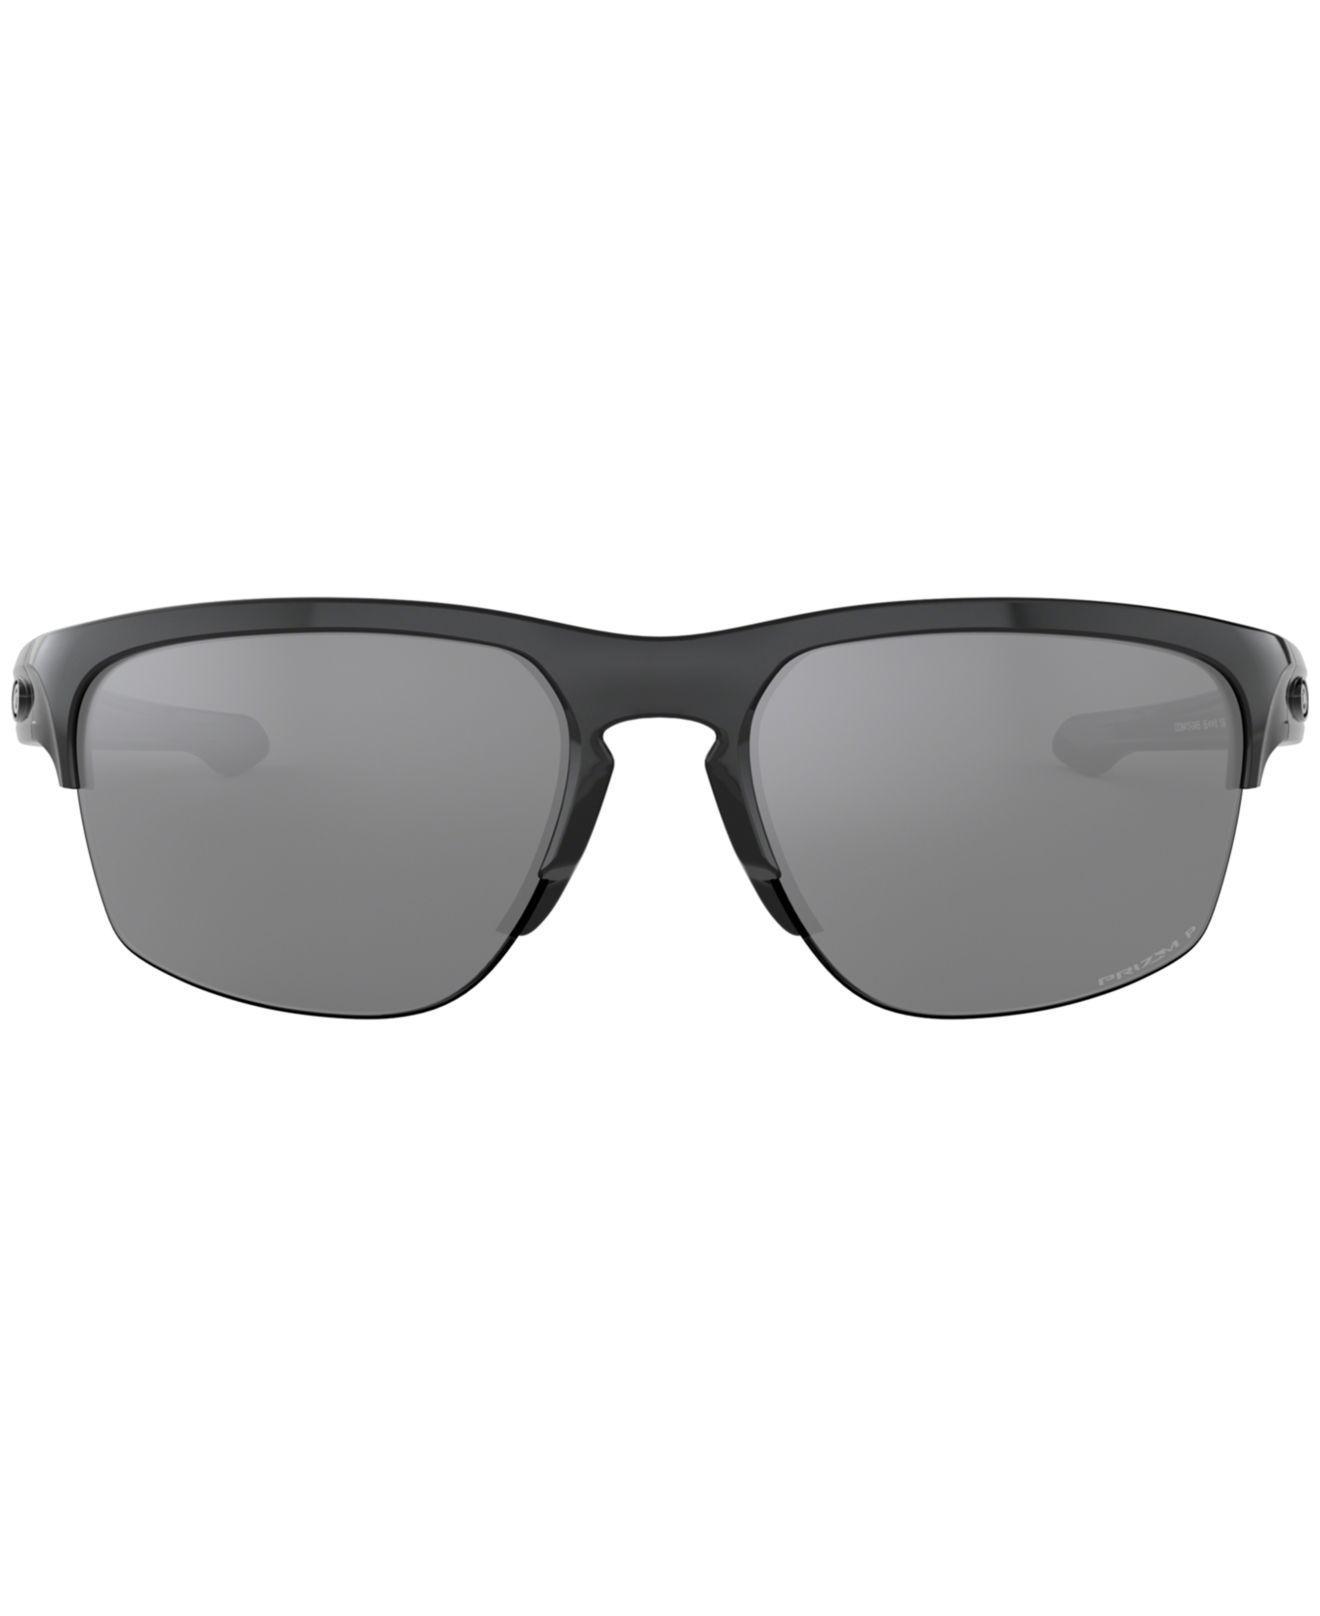 92d2aad003f Lyst - Oakley Sliver Edge Sunglasses